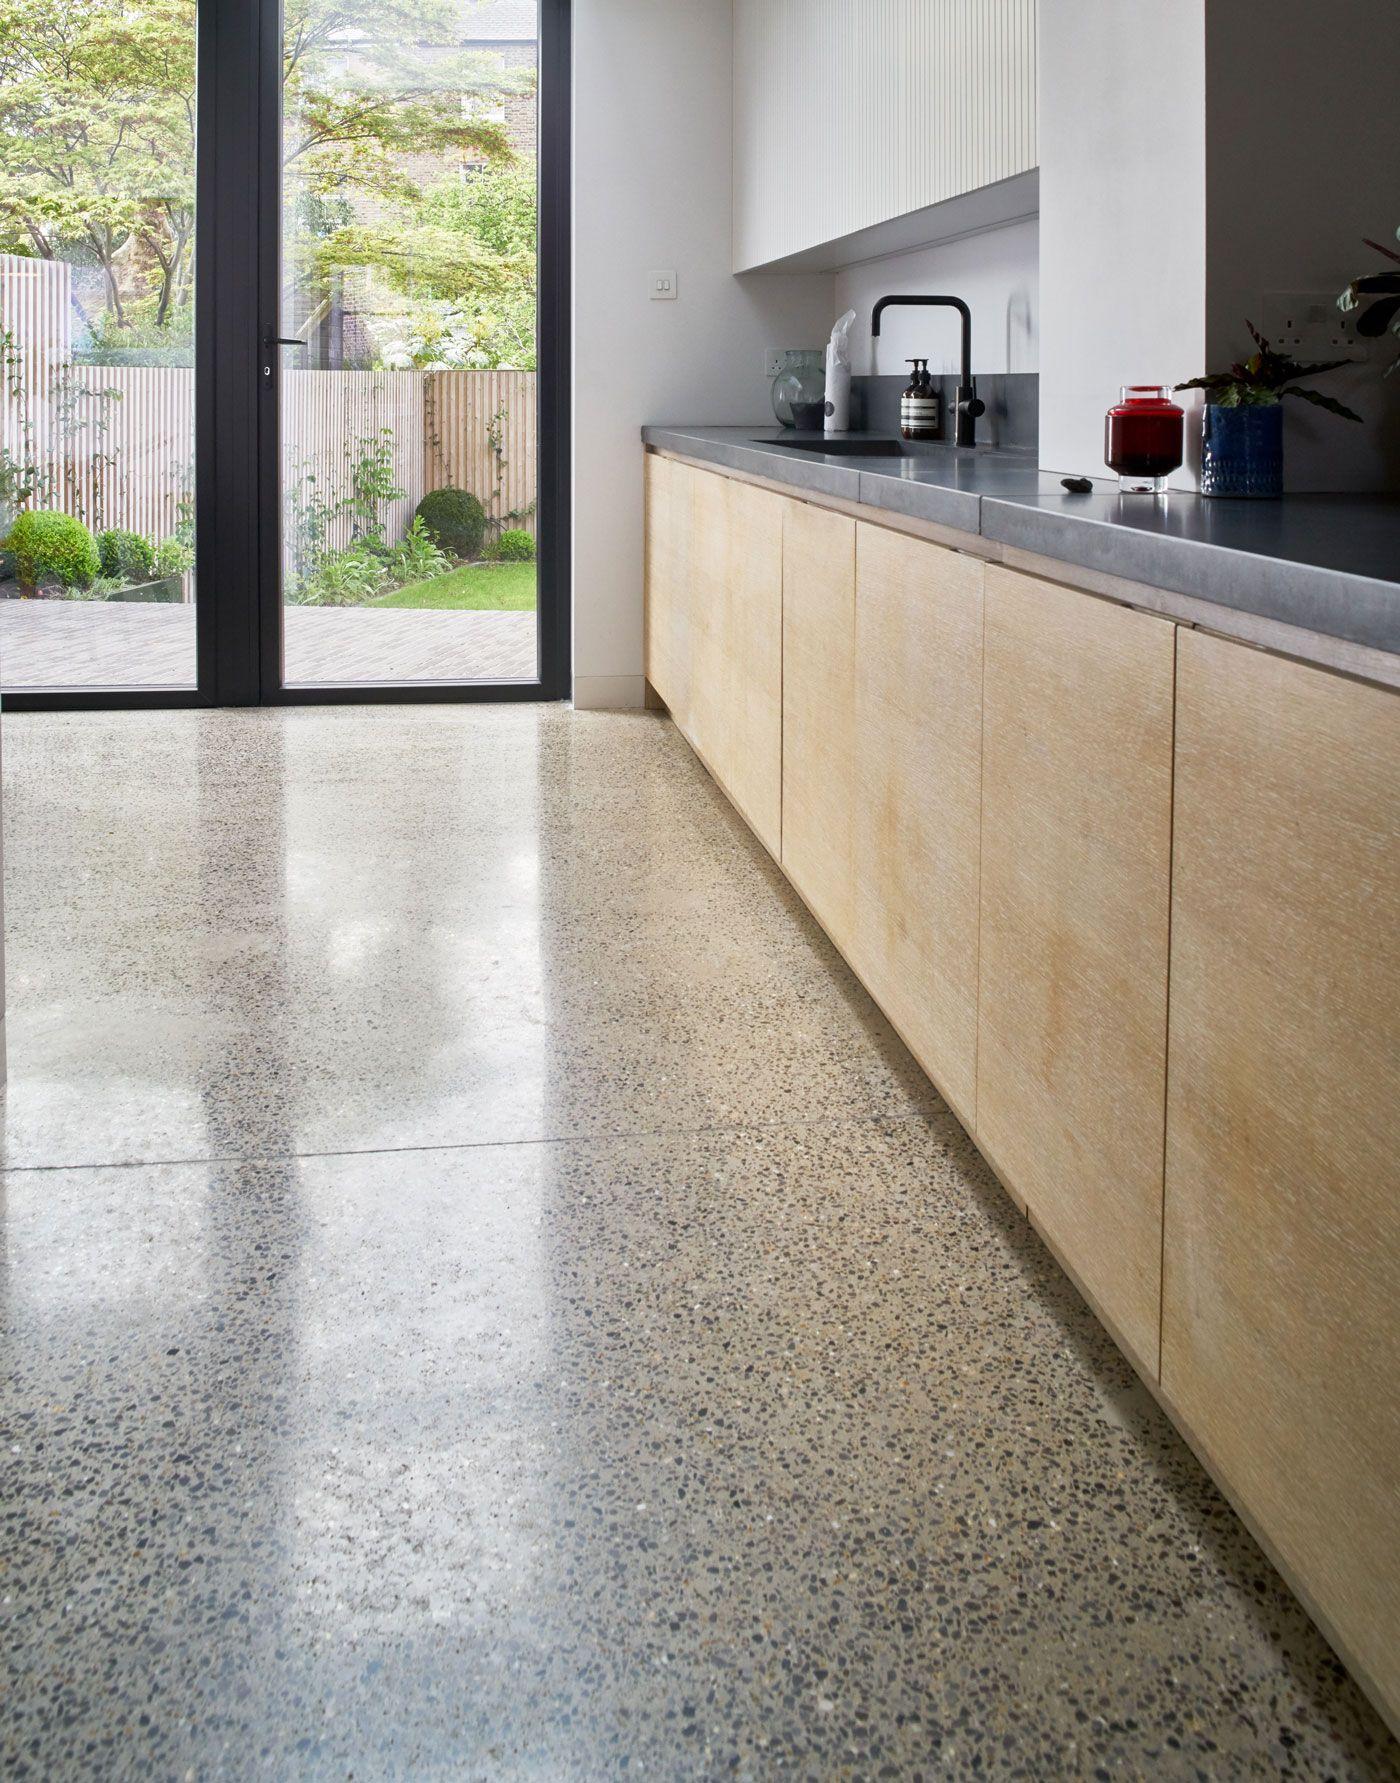 Sq1 Design Ltd Limed Oak Kitchen Concrete Worktop Birch Ply Cabinets Lined Door Detail In Concrete Kitchen Floor Birch Kitchen Cabinets Concrete Kitchen